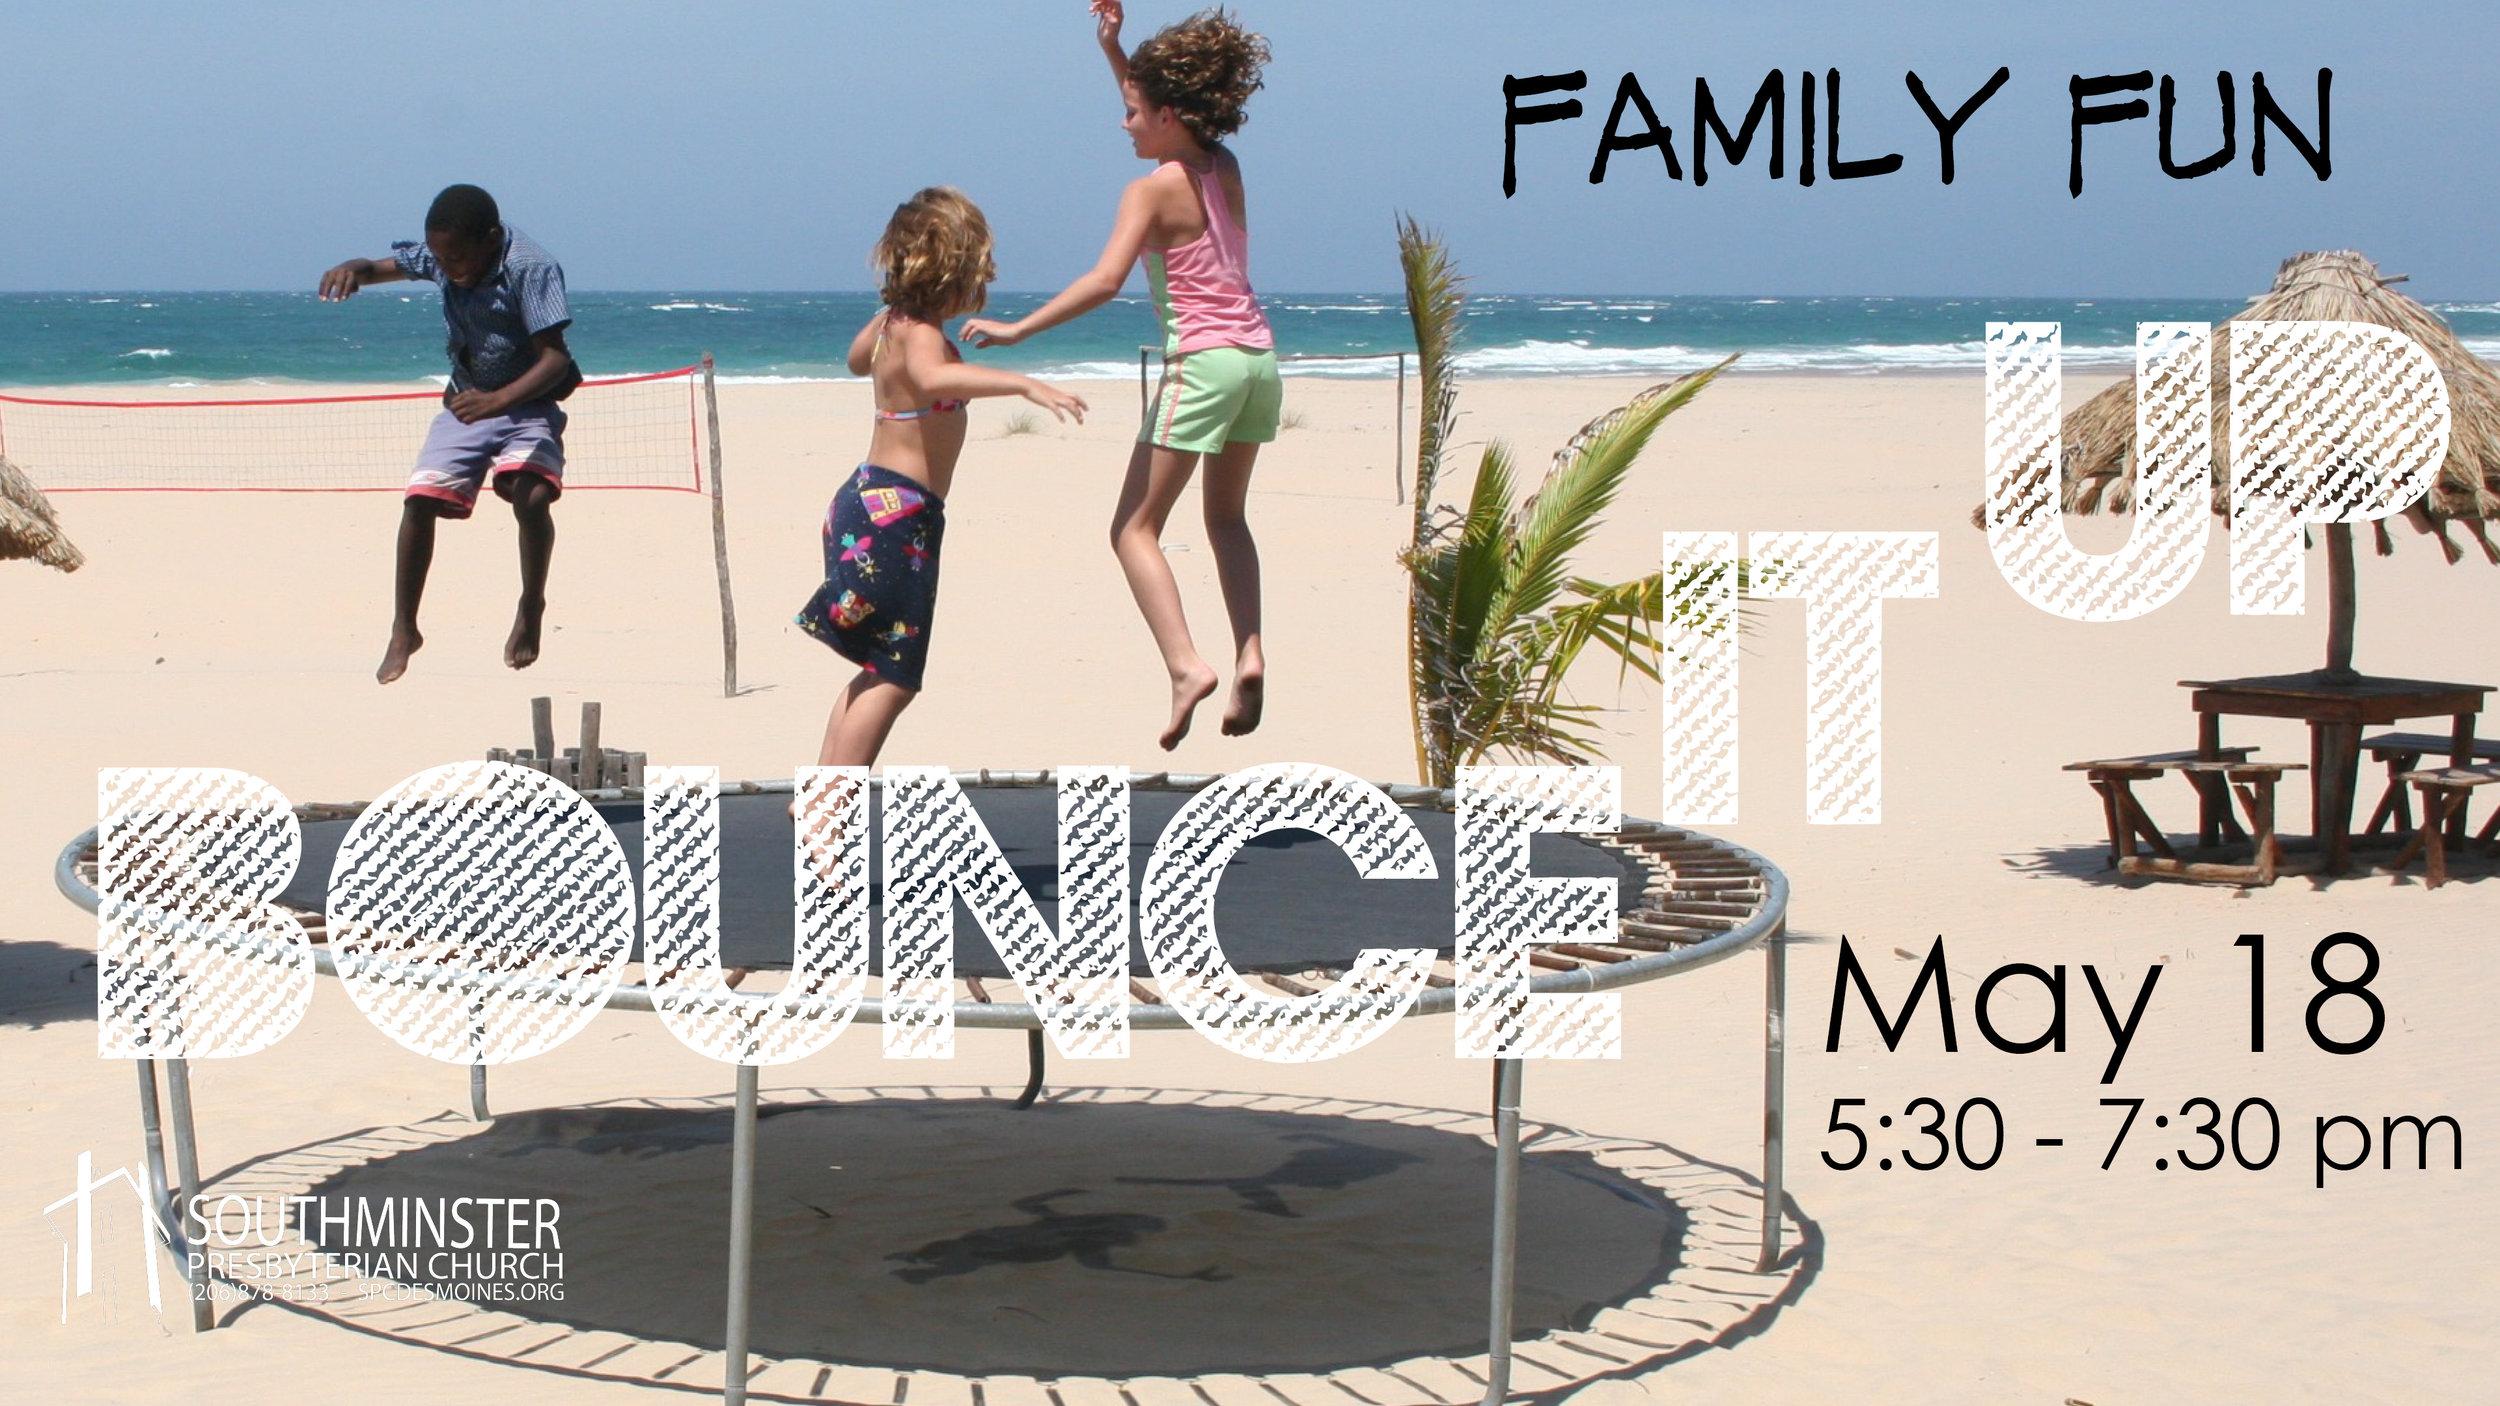 2019.05.18 - Family Fun Bounce it up.jpg